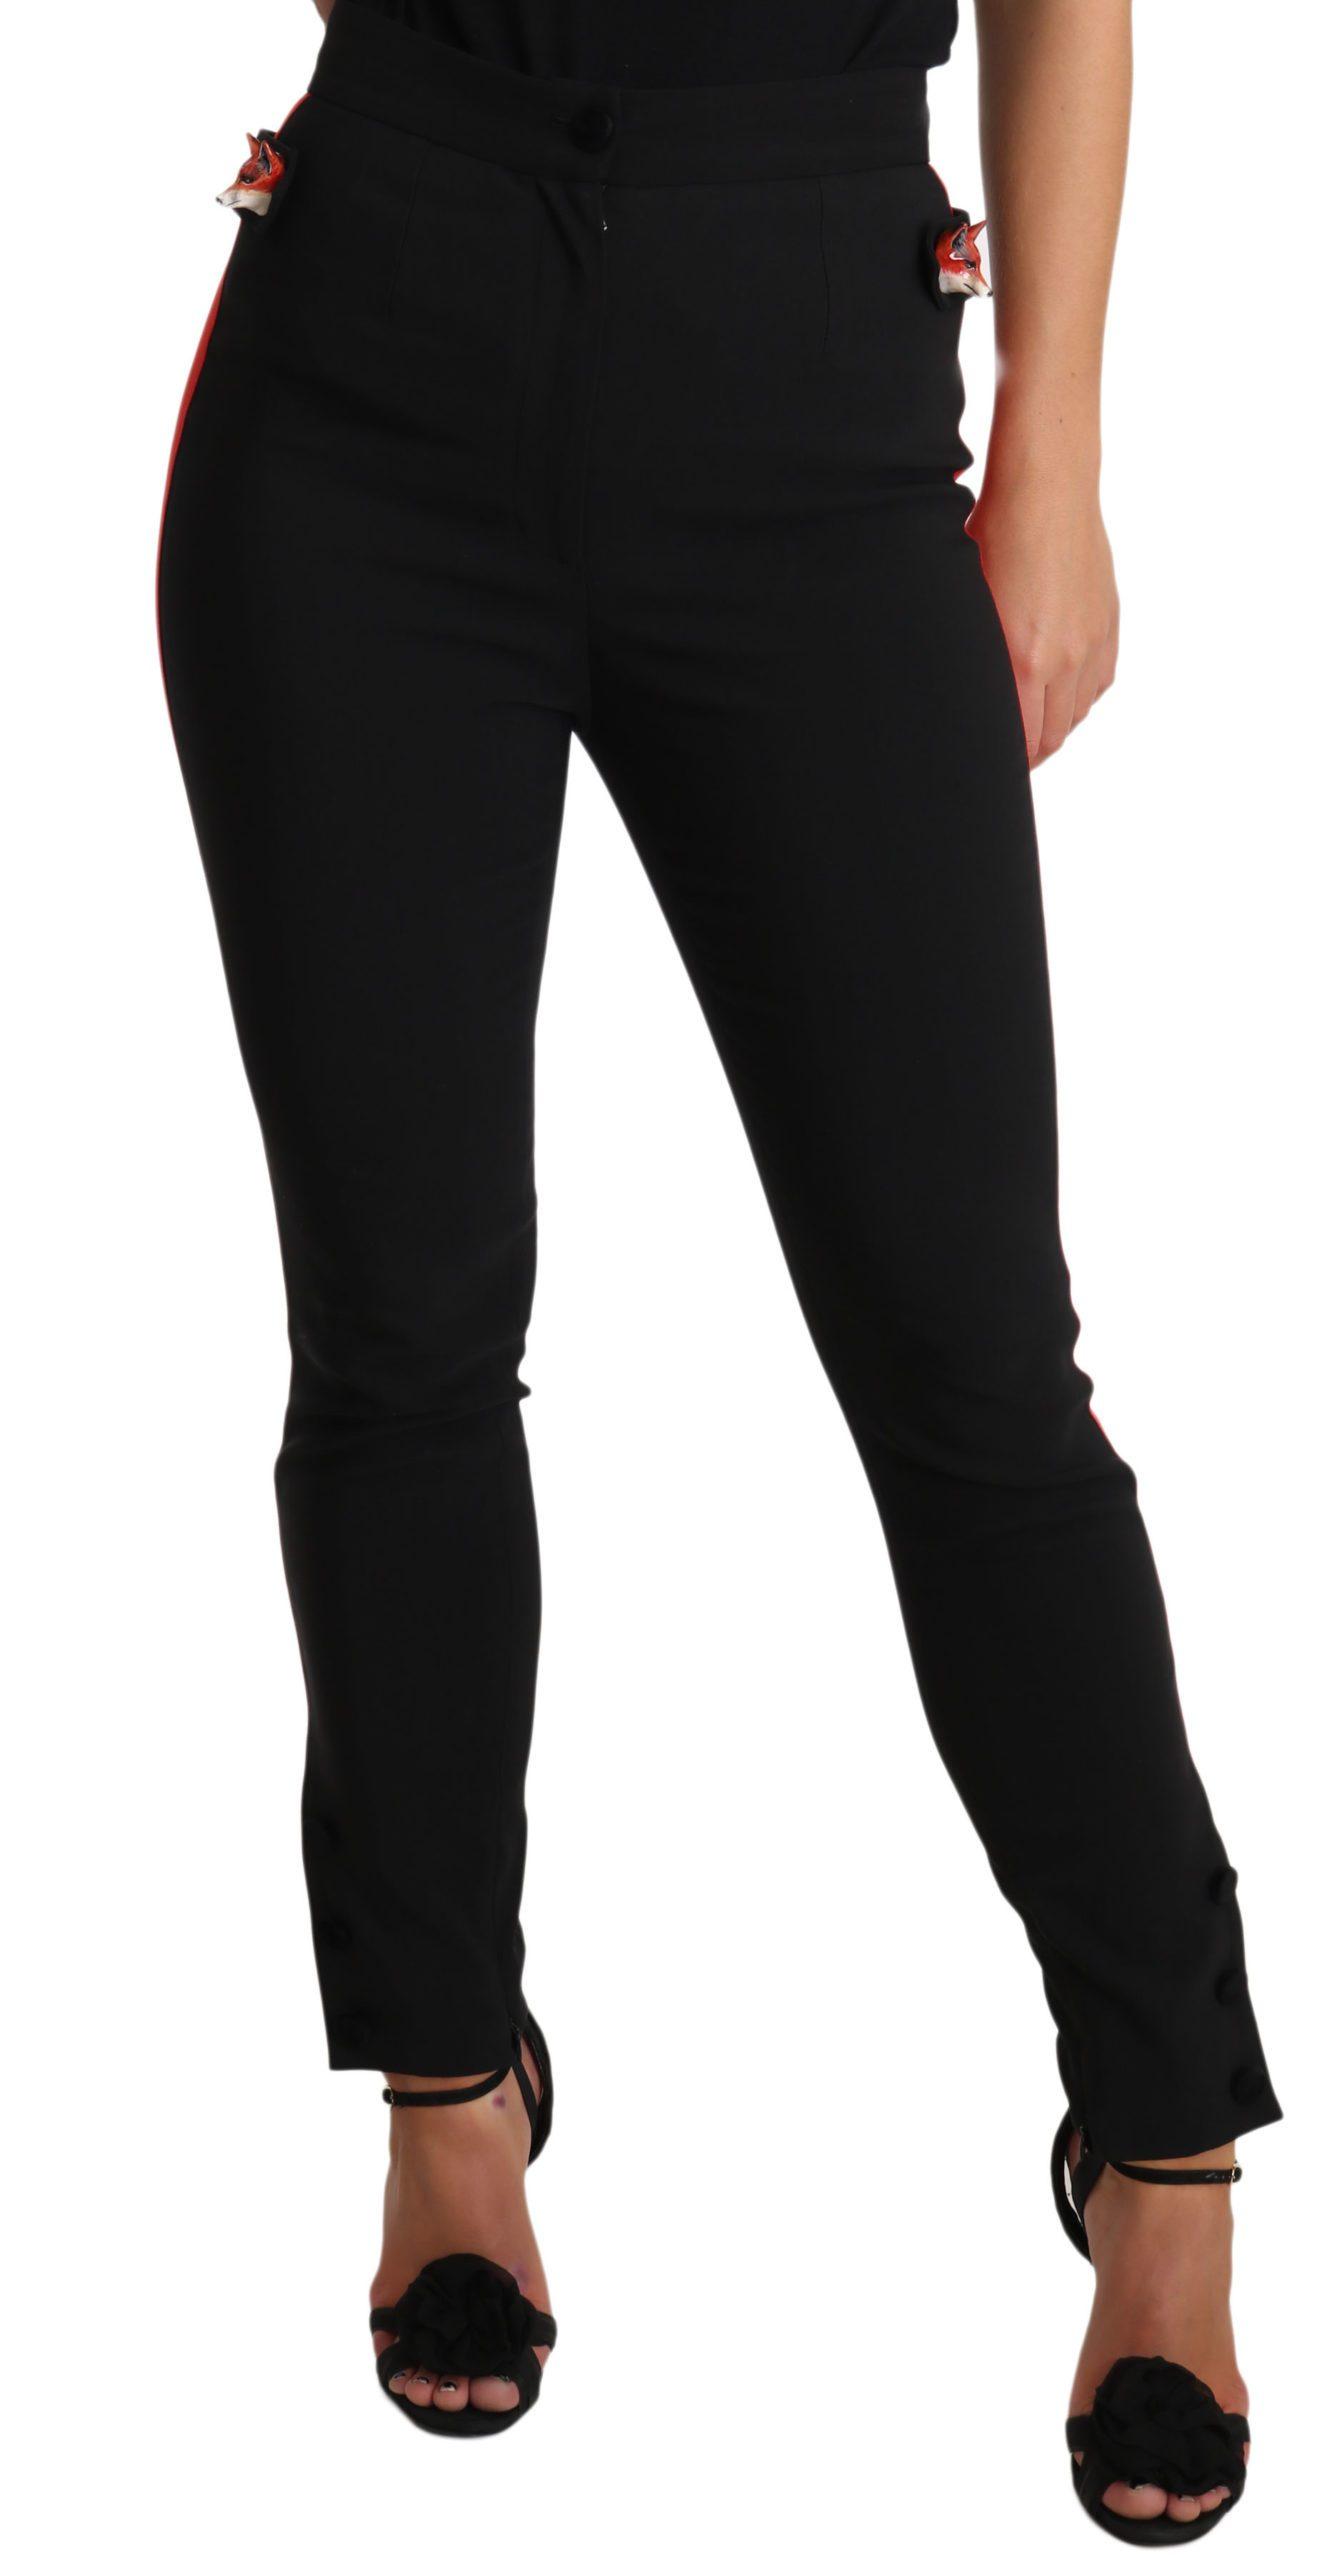 Dolce & Gabbana Women's Trouser Black PAN70075 - IT40|S